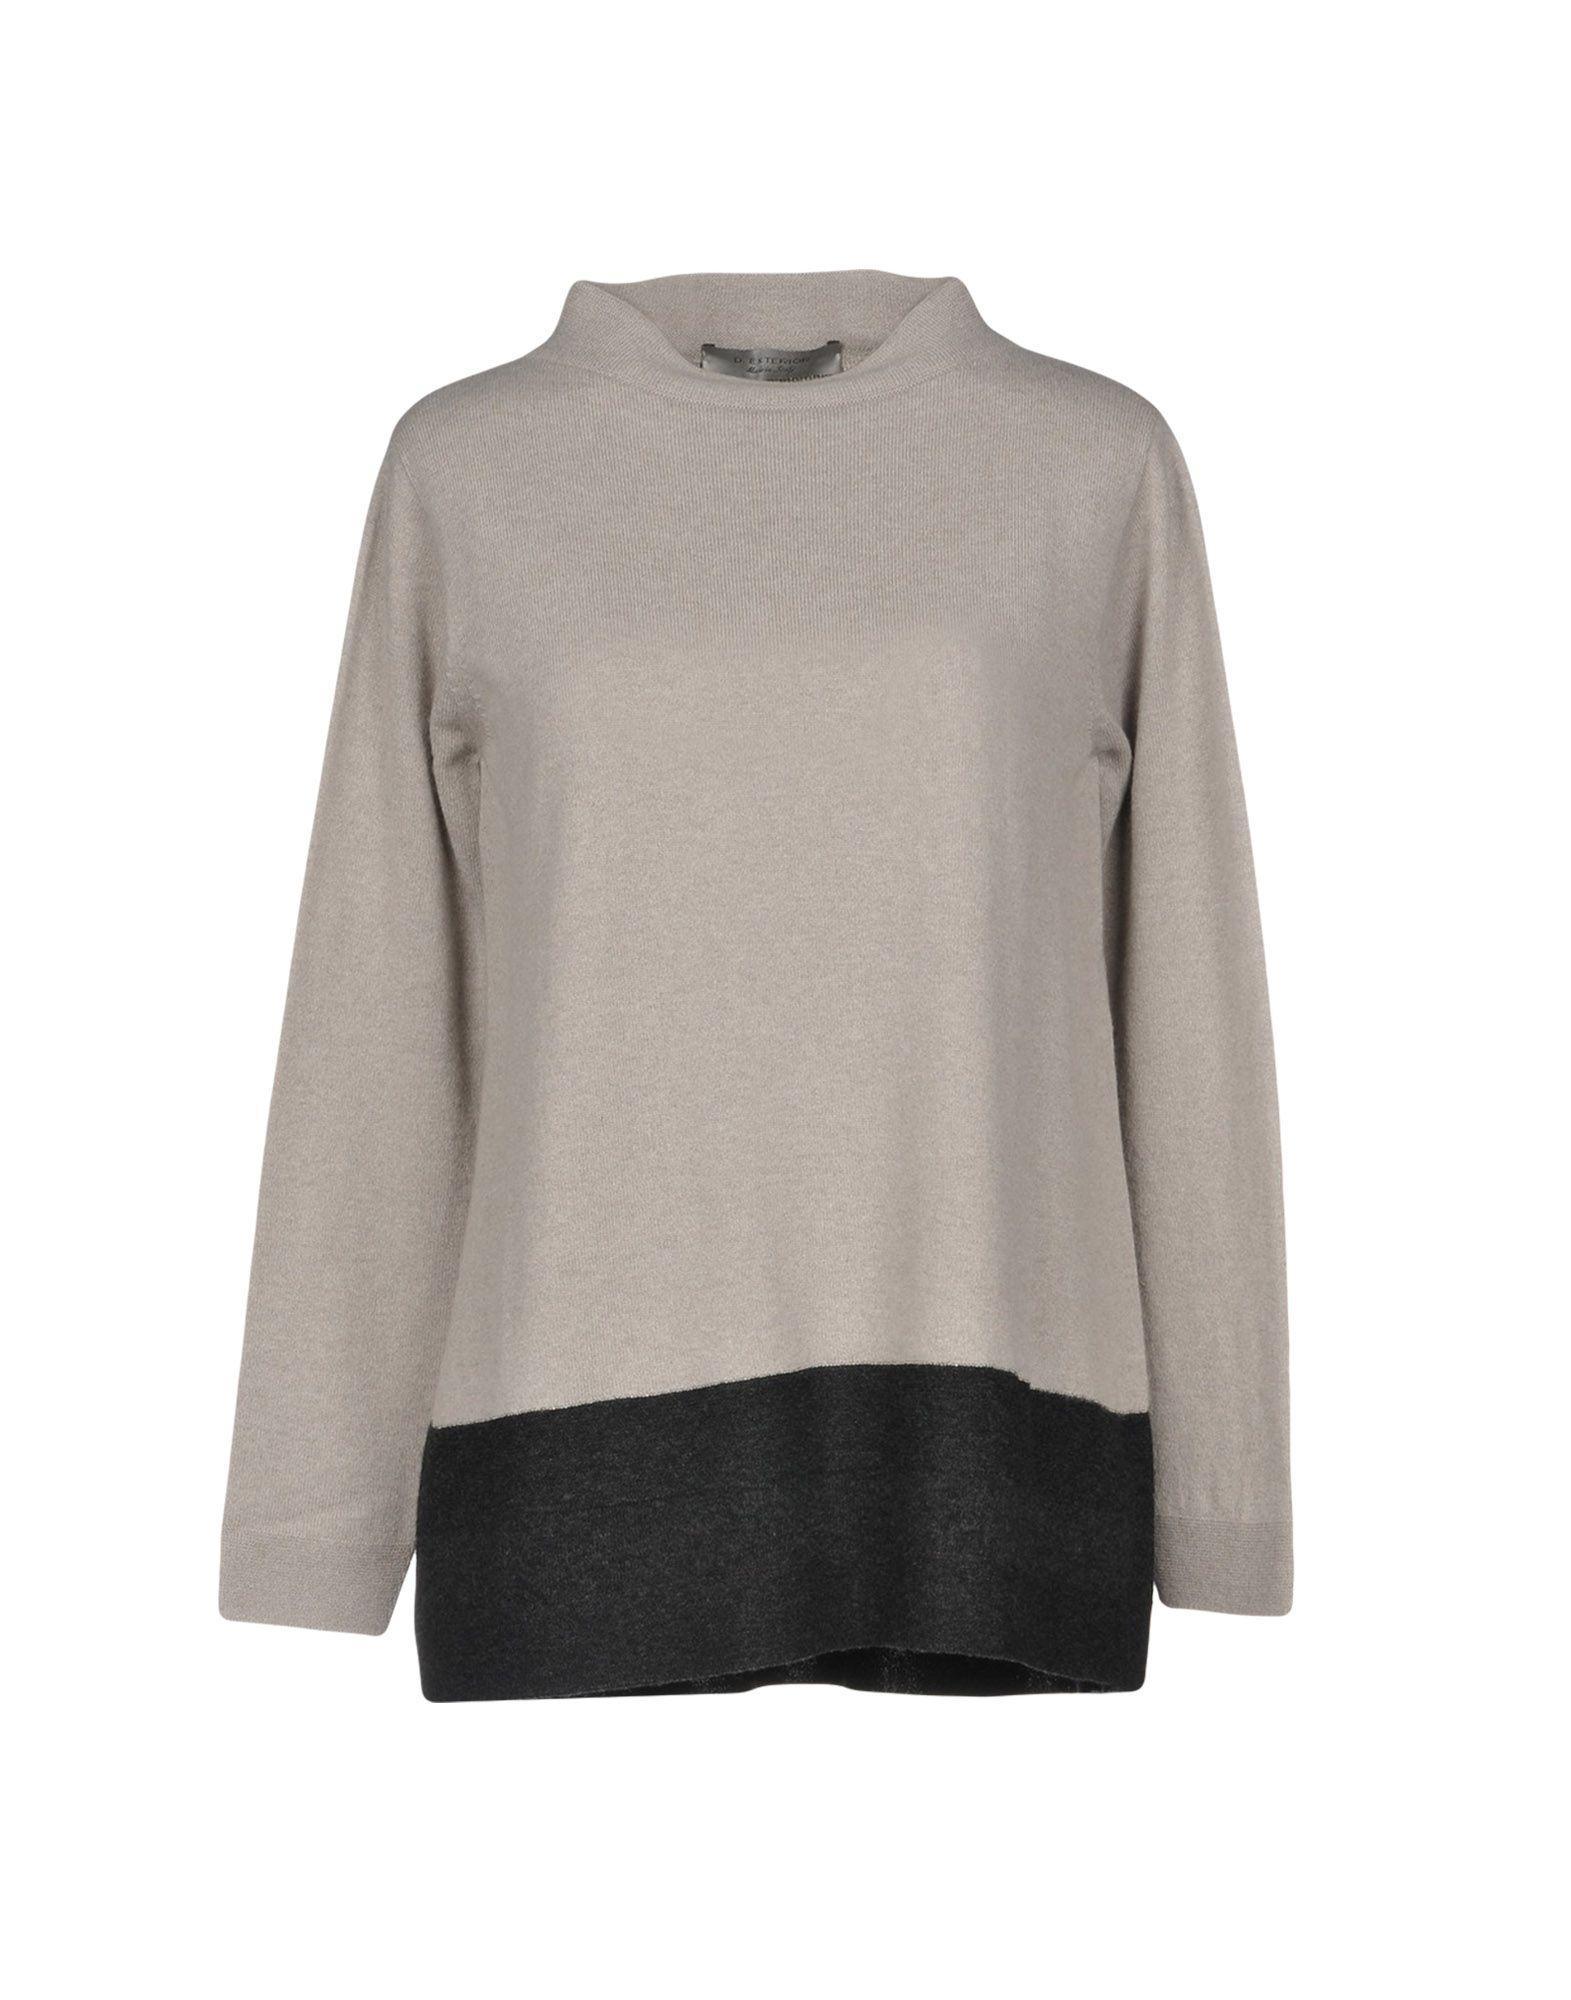 D.exterior Cashmere Blend In Light Grey